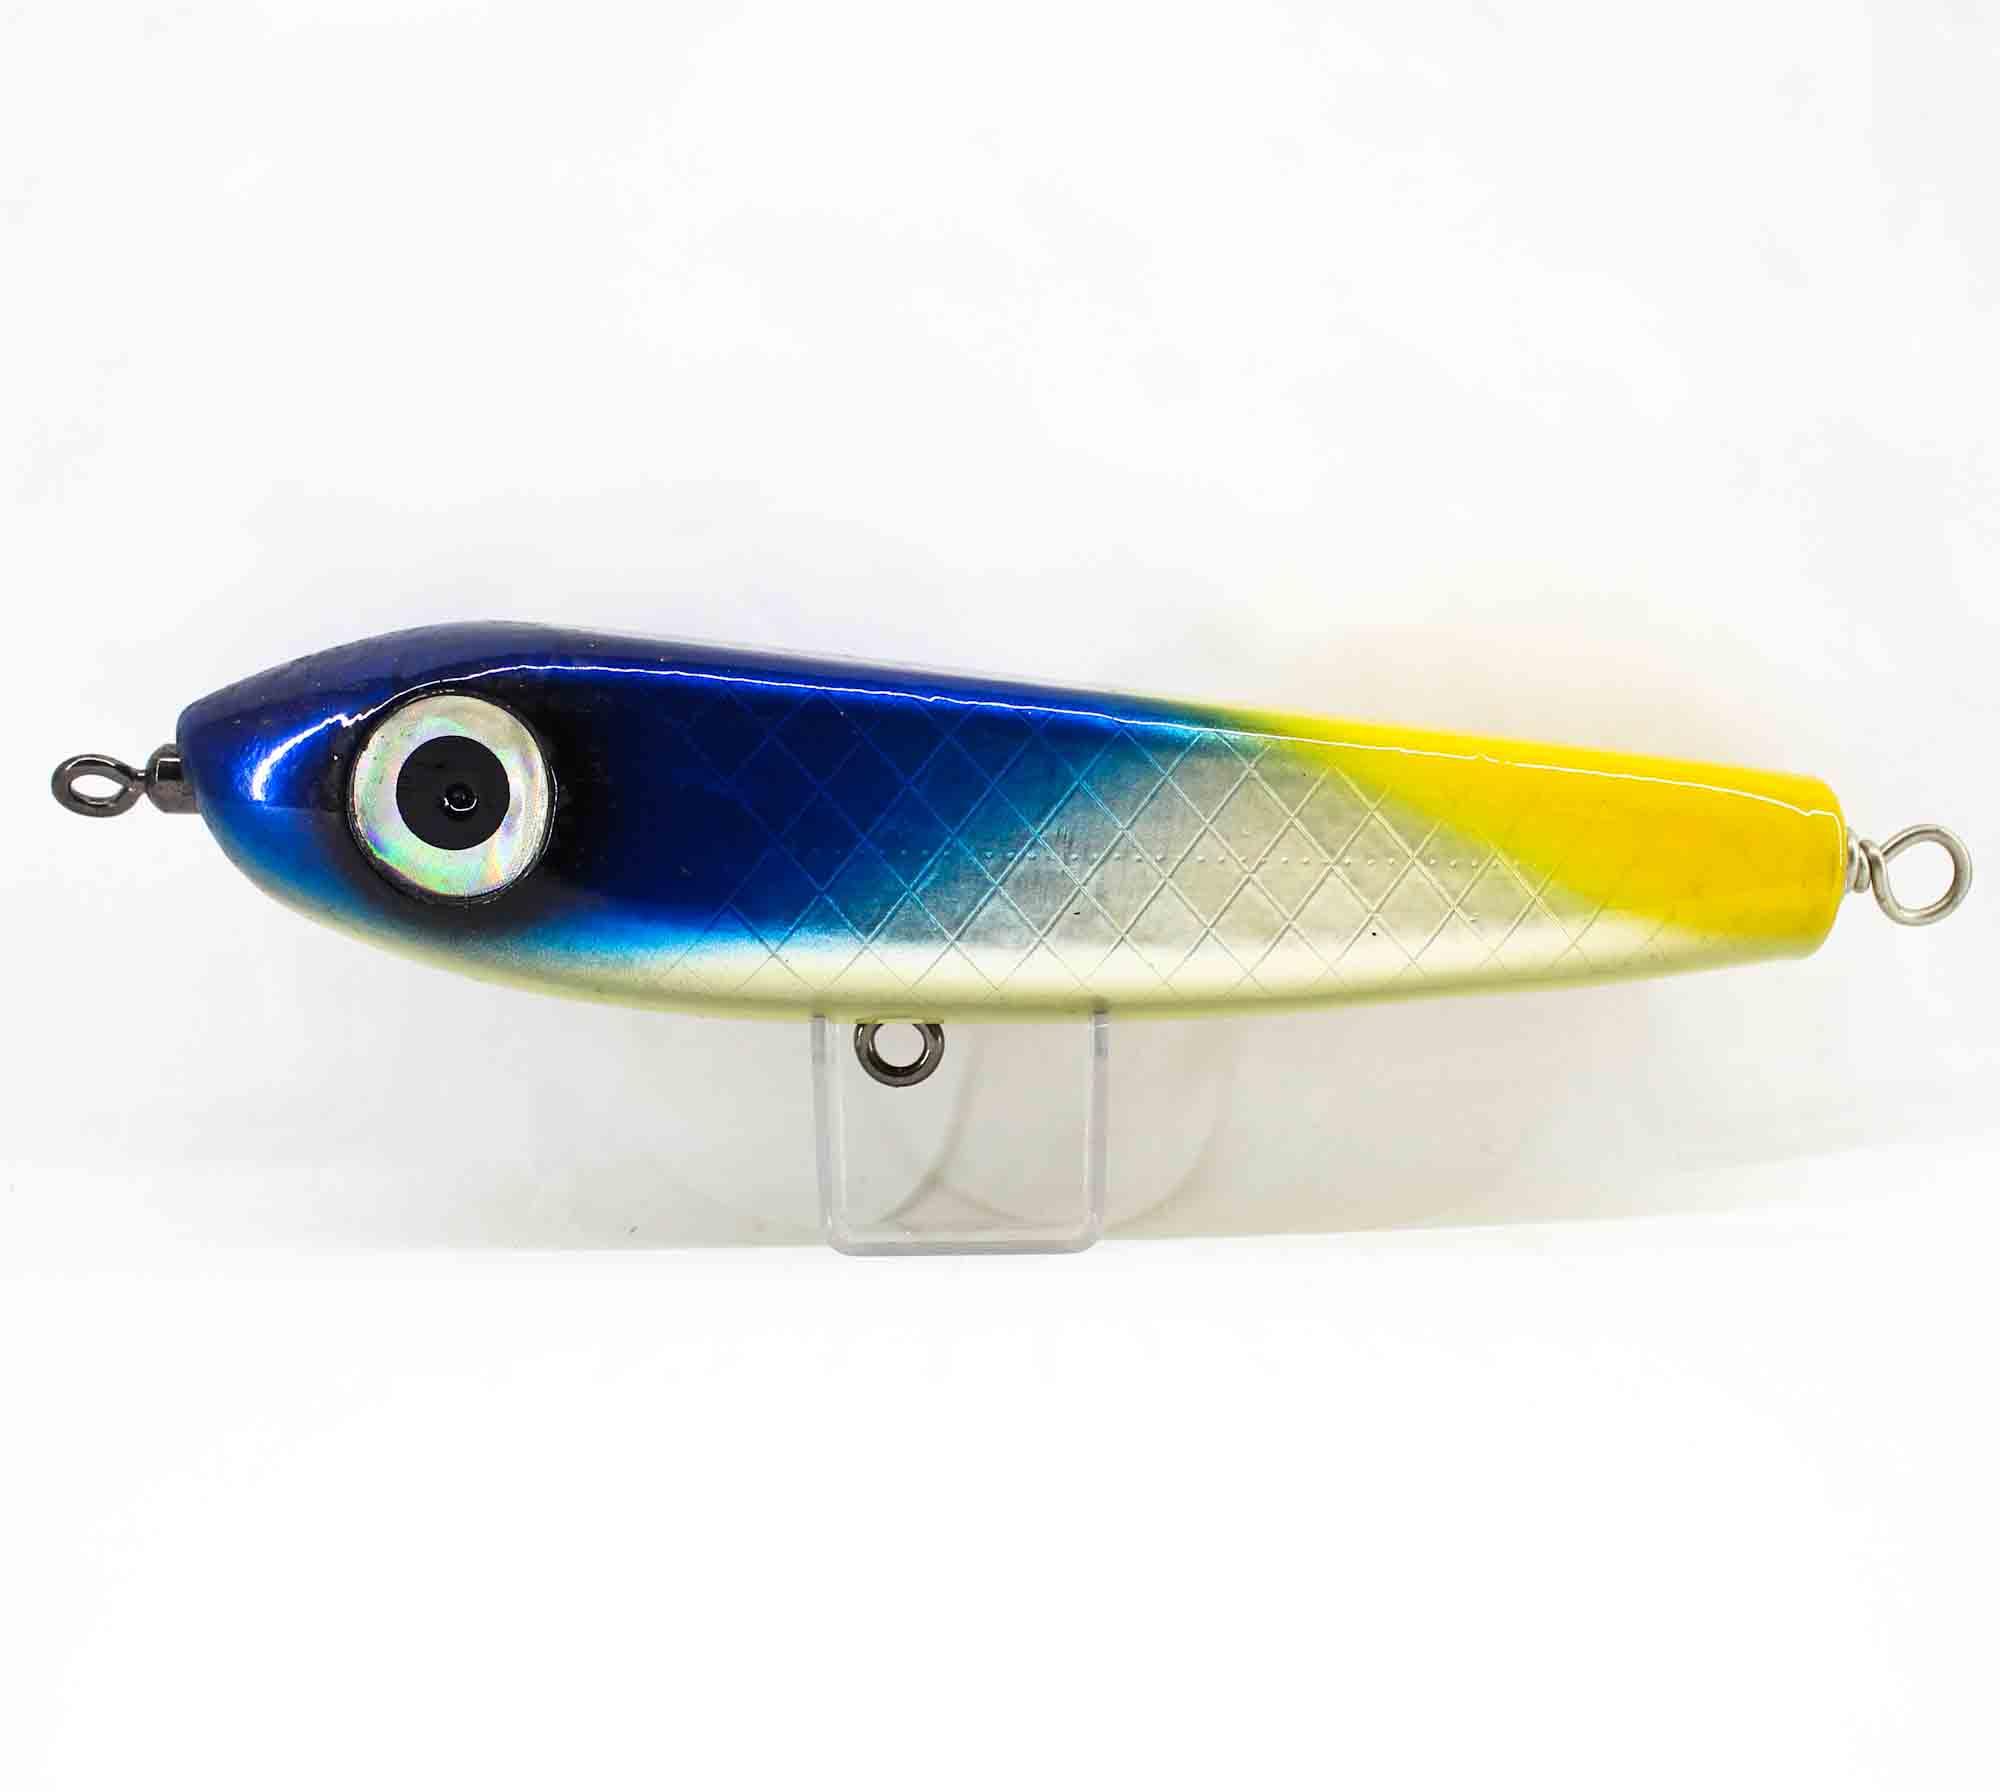 Maggy Gara Jerk Bait 2 190cm Pencil Lure Blue Yellow (2037)